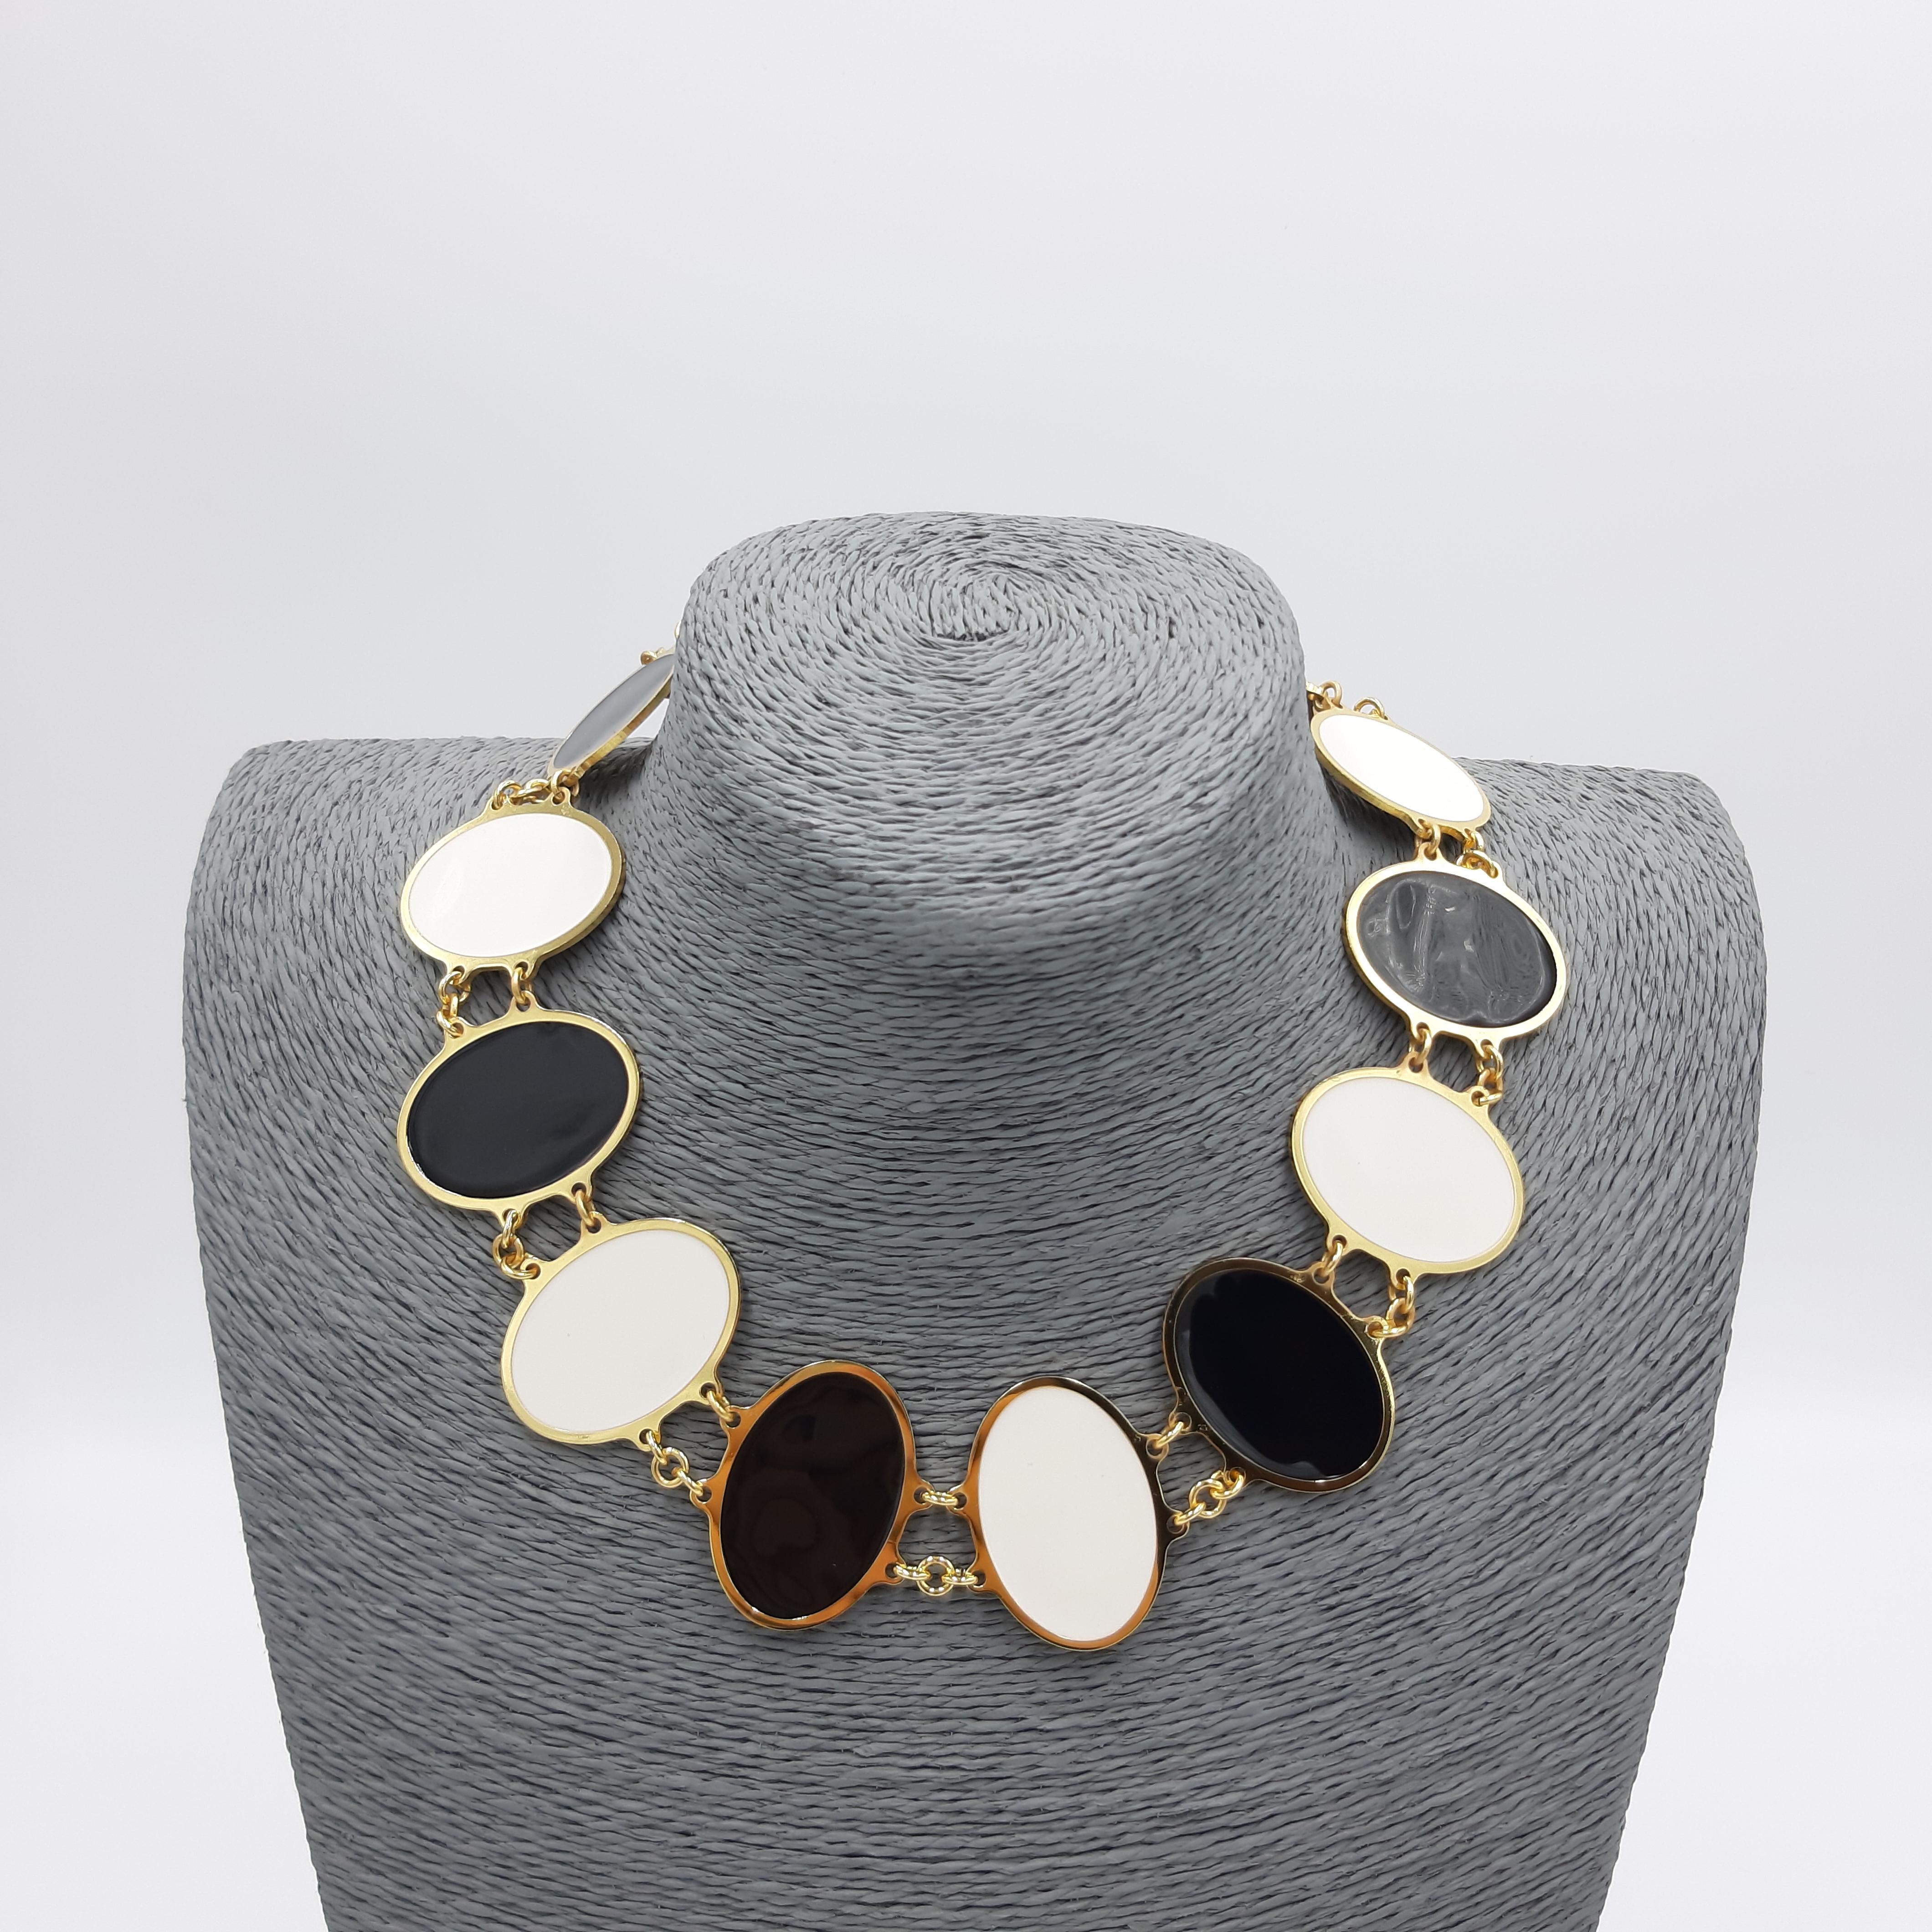 Collana girocollo bianca e nera Francesca Bianchi Design